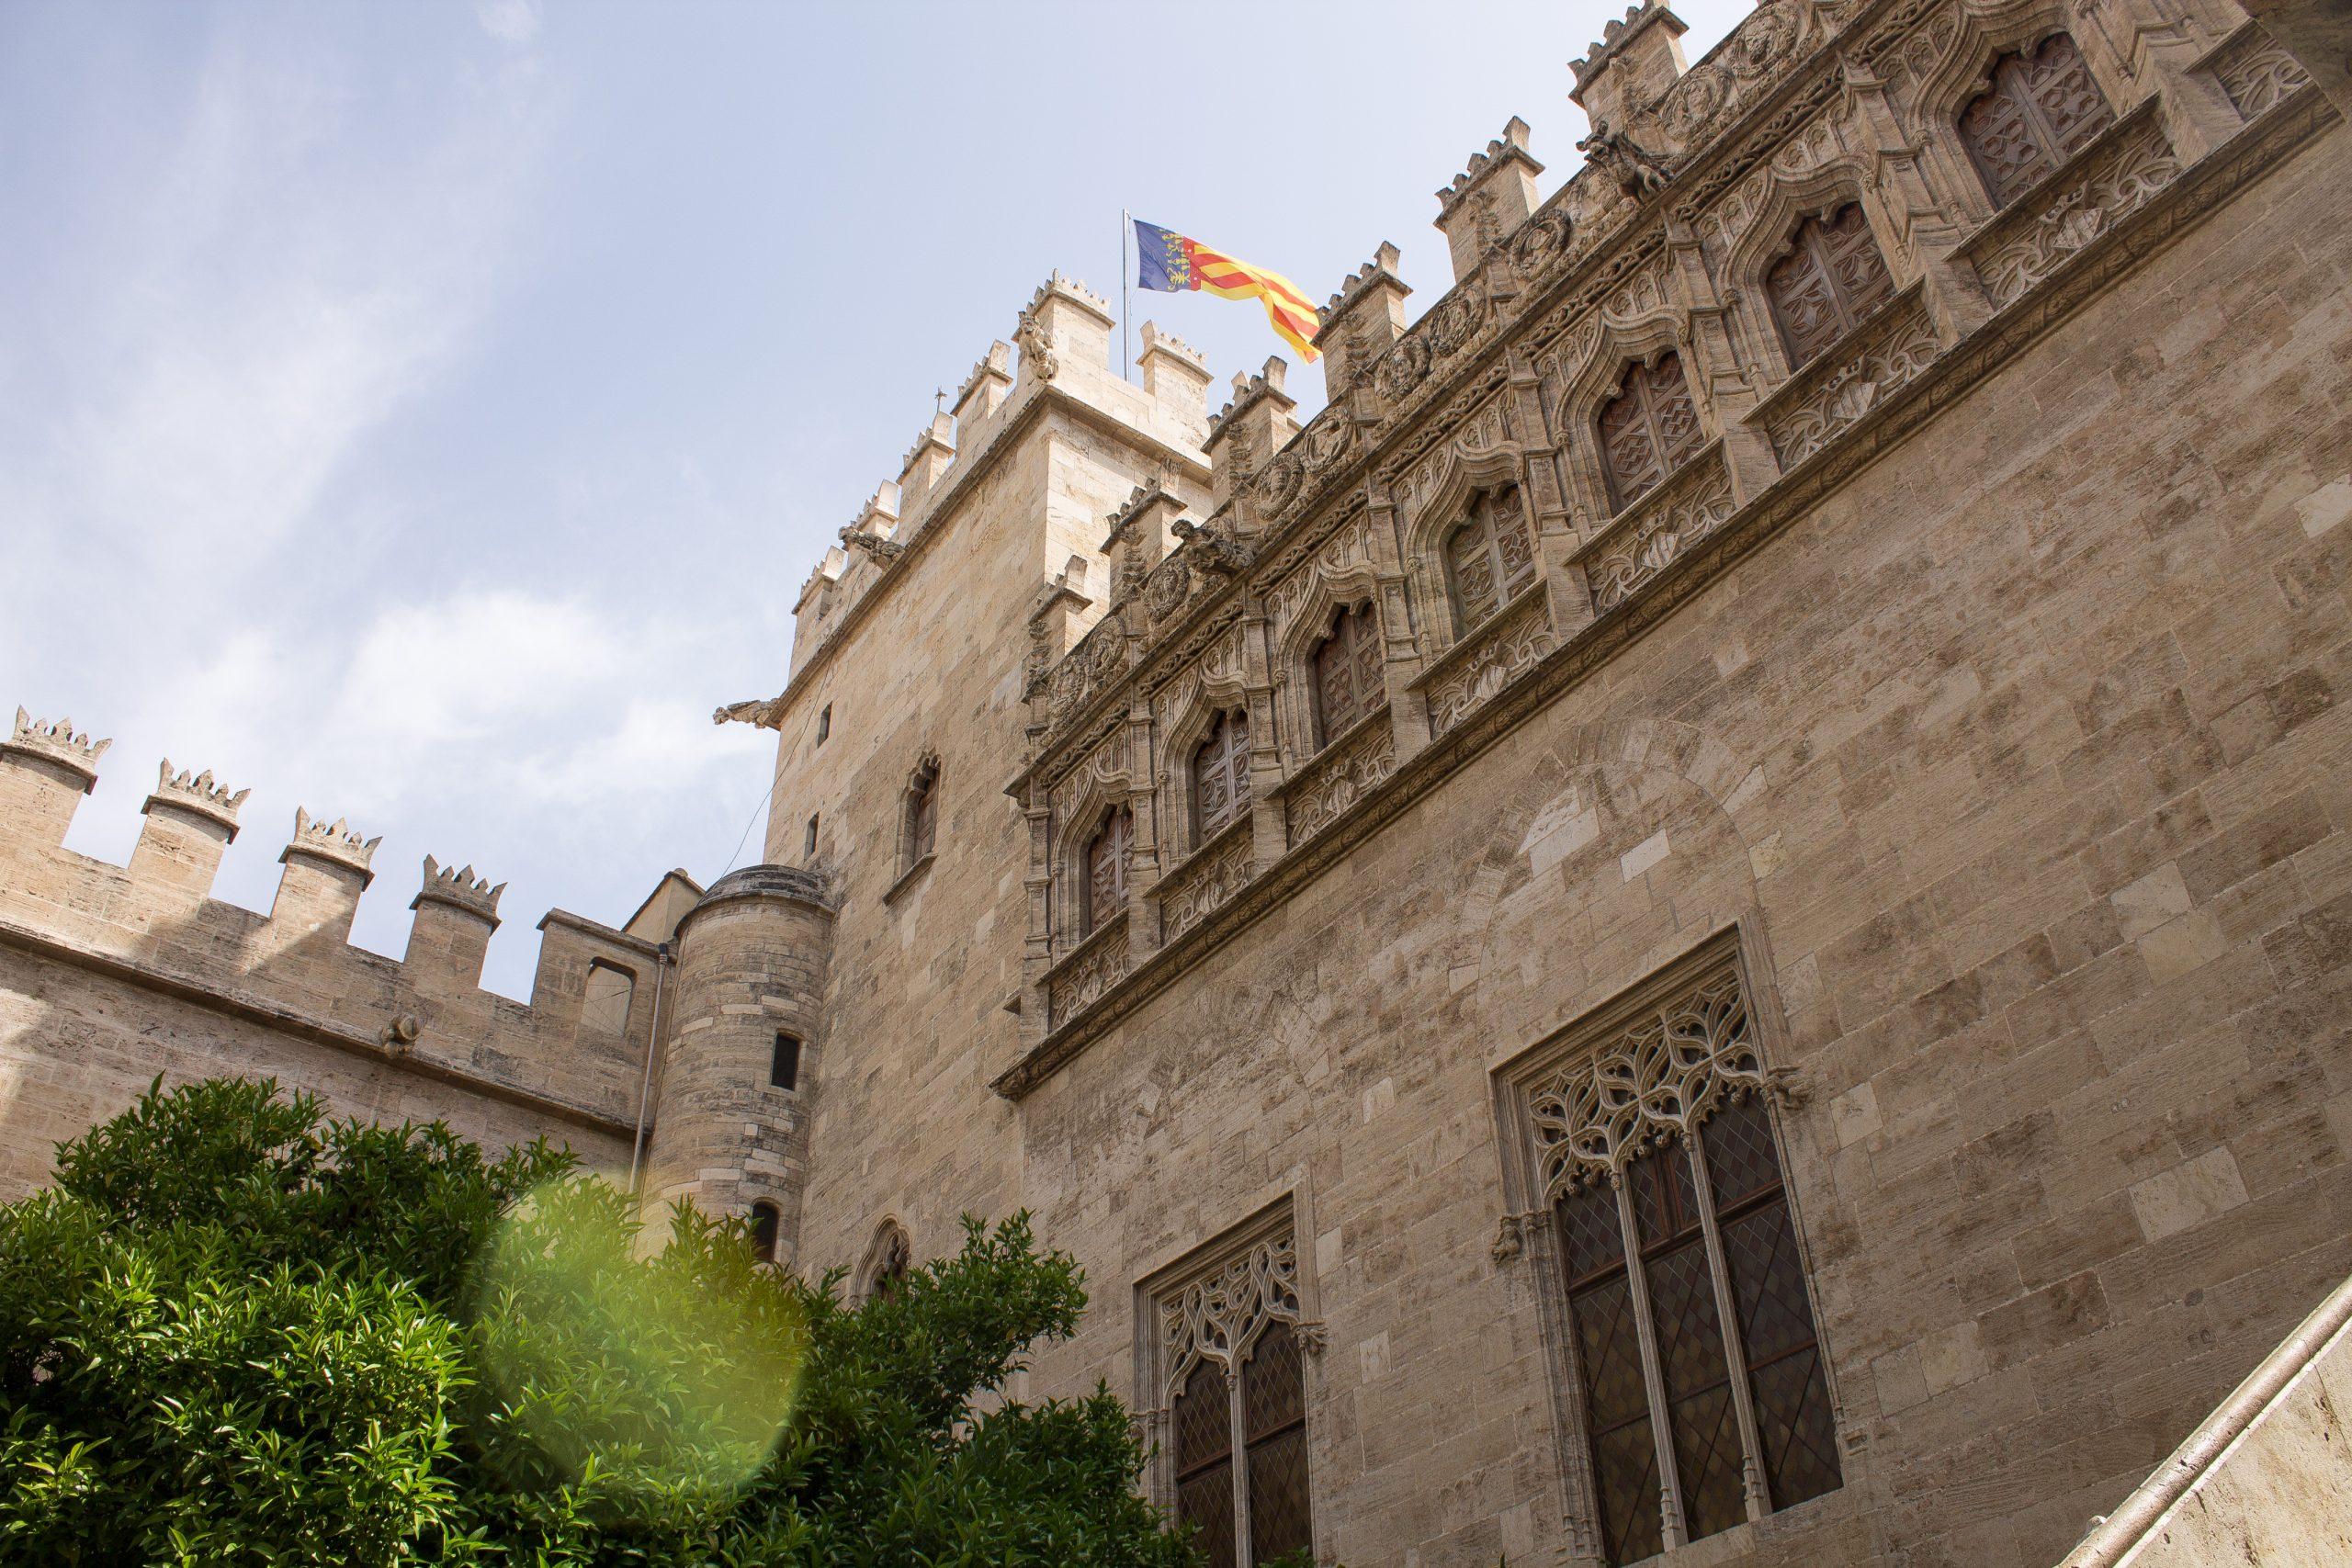 la llotja with flag - Valencia